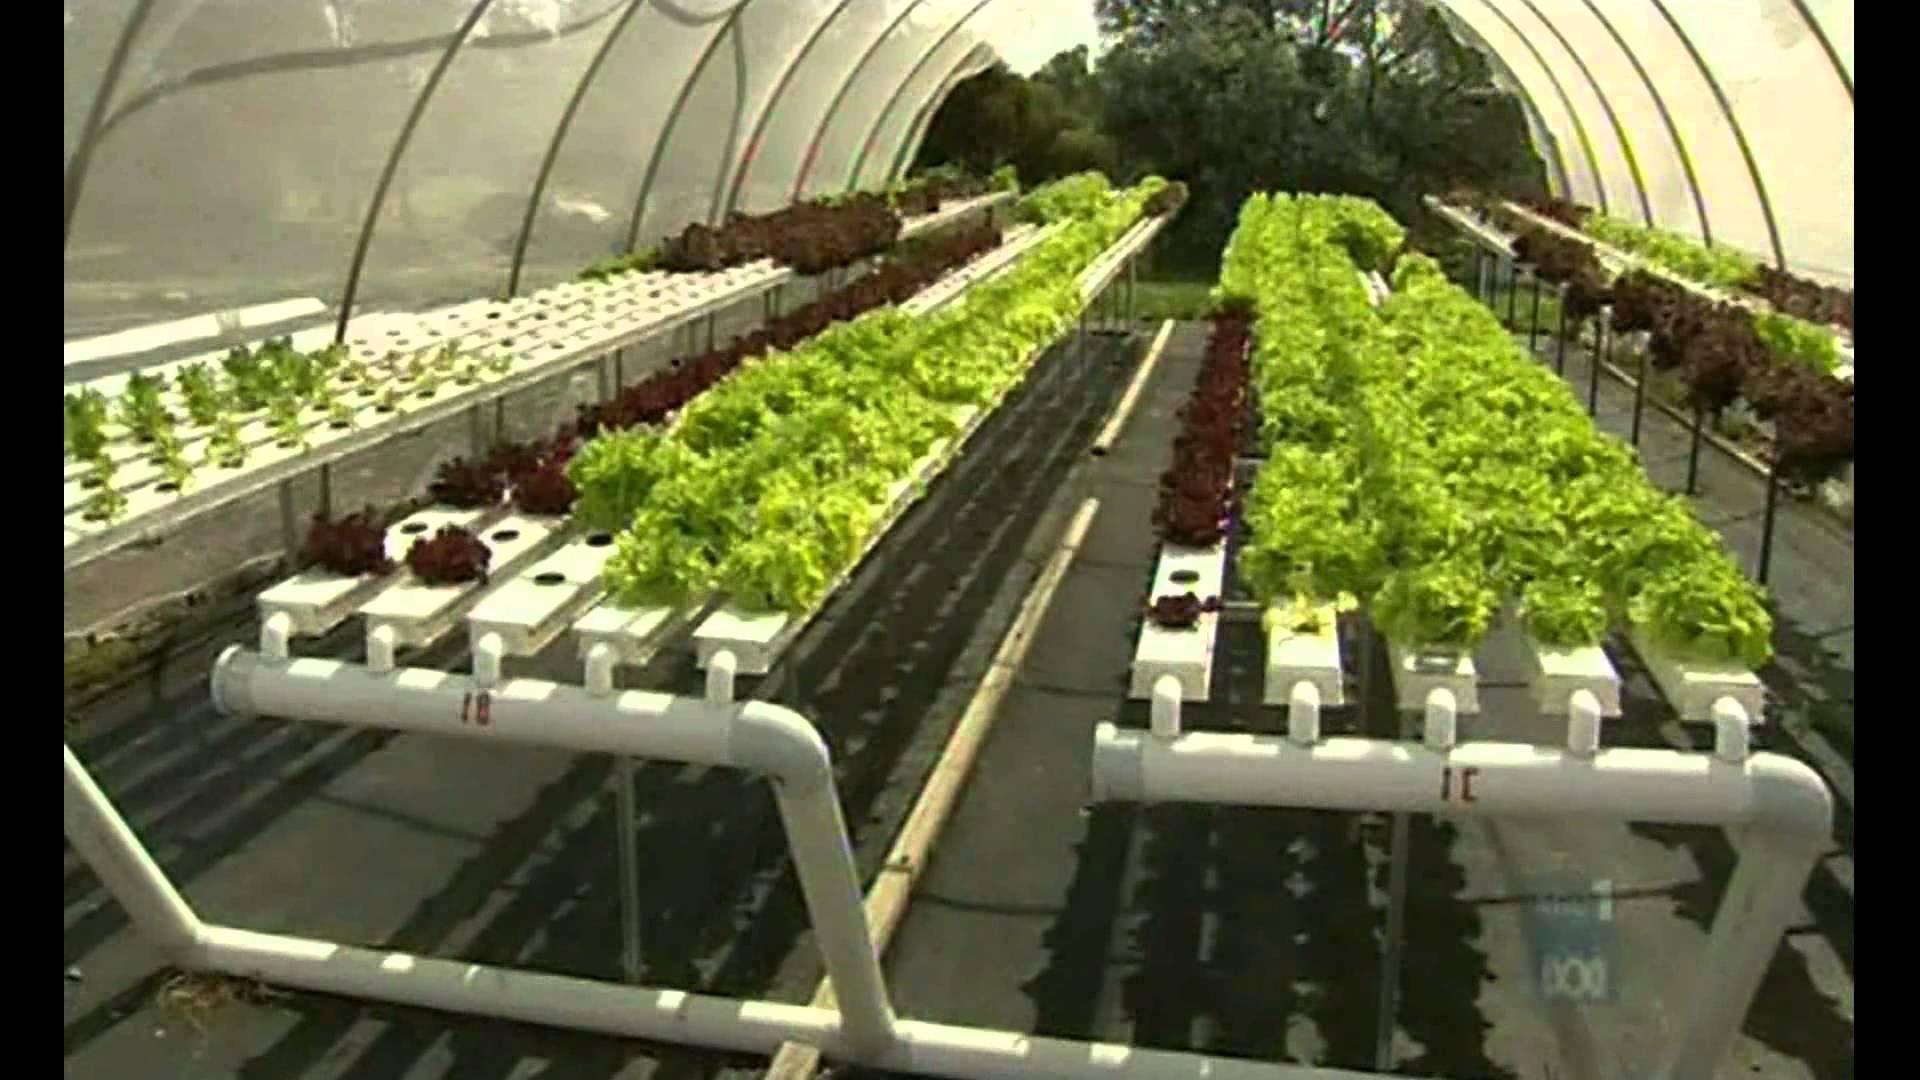 Aquaponic Integrated Farming Aquaponics, Aquaponics